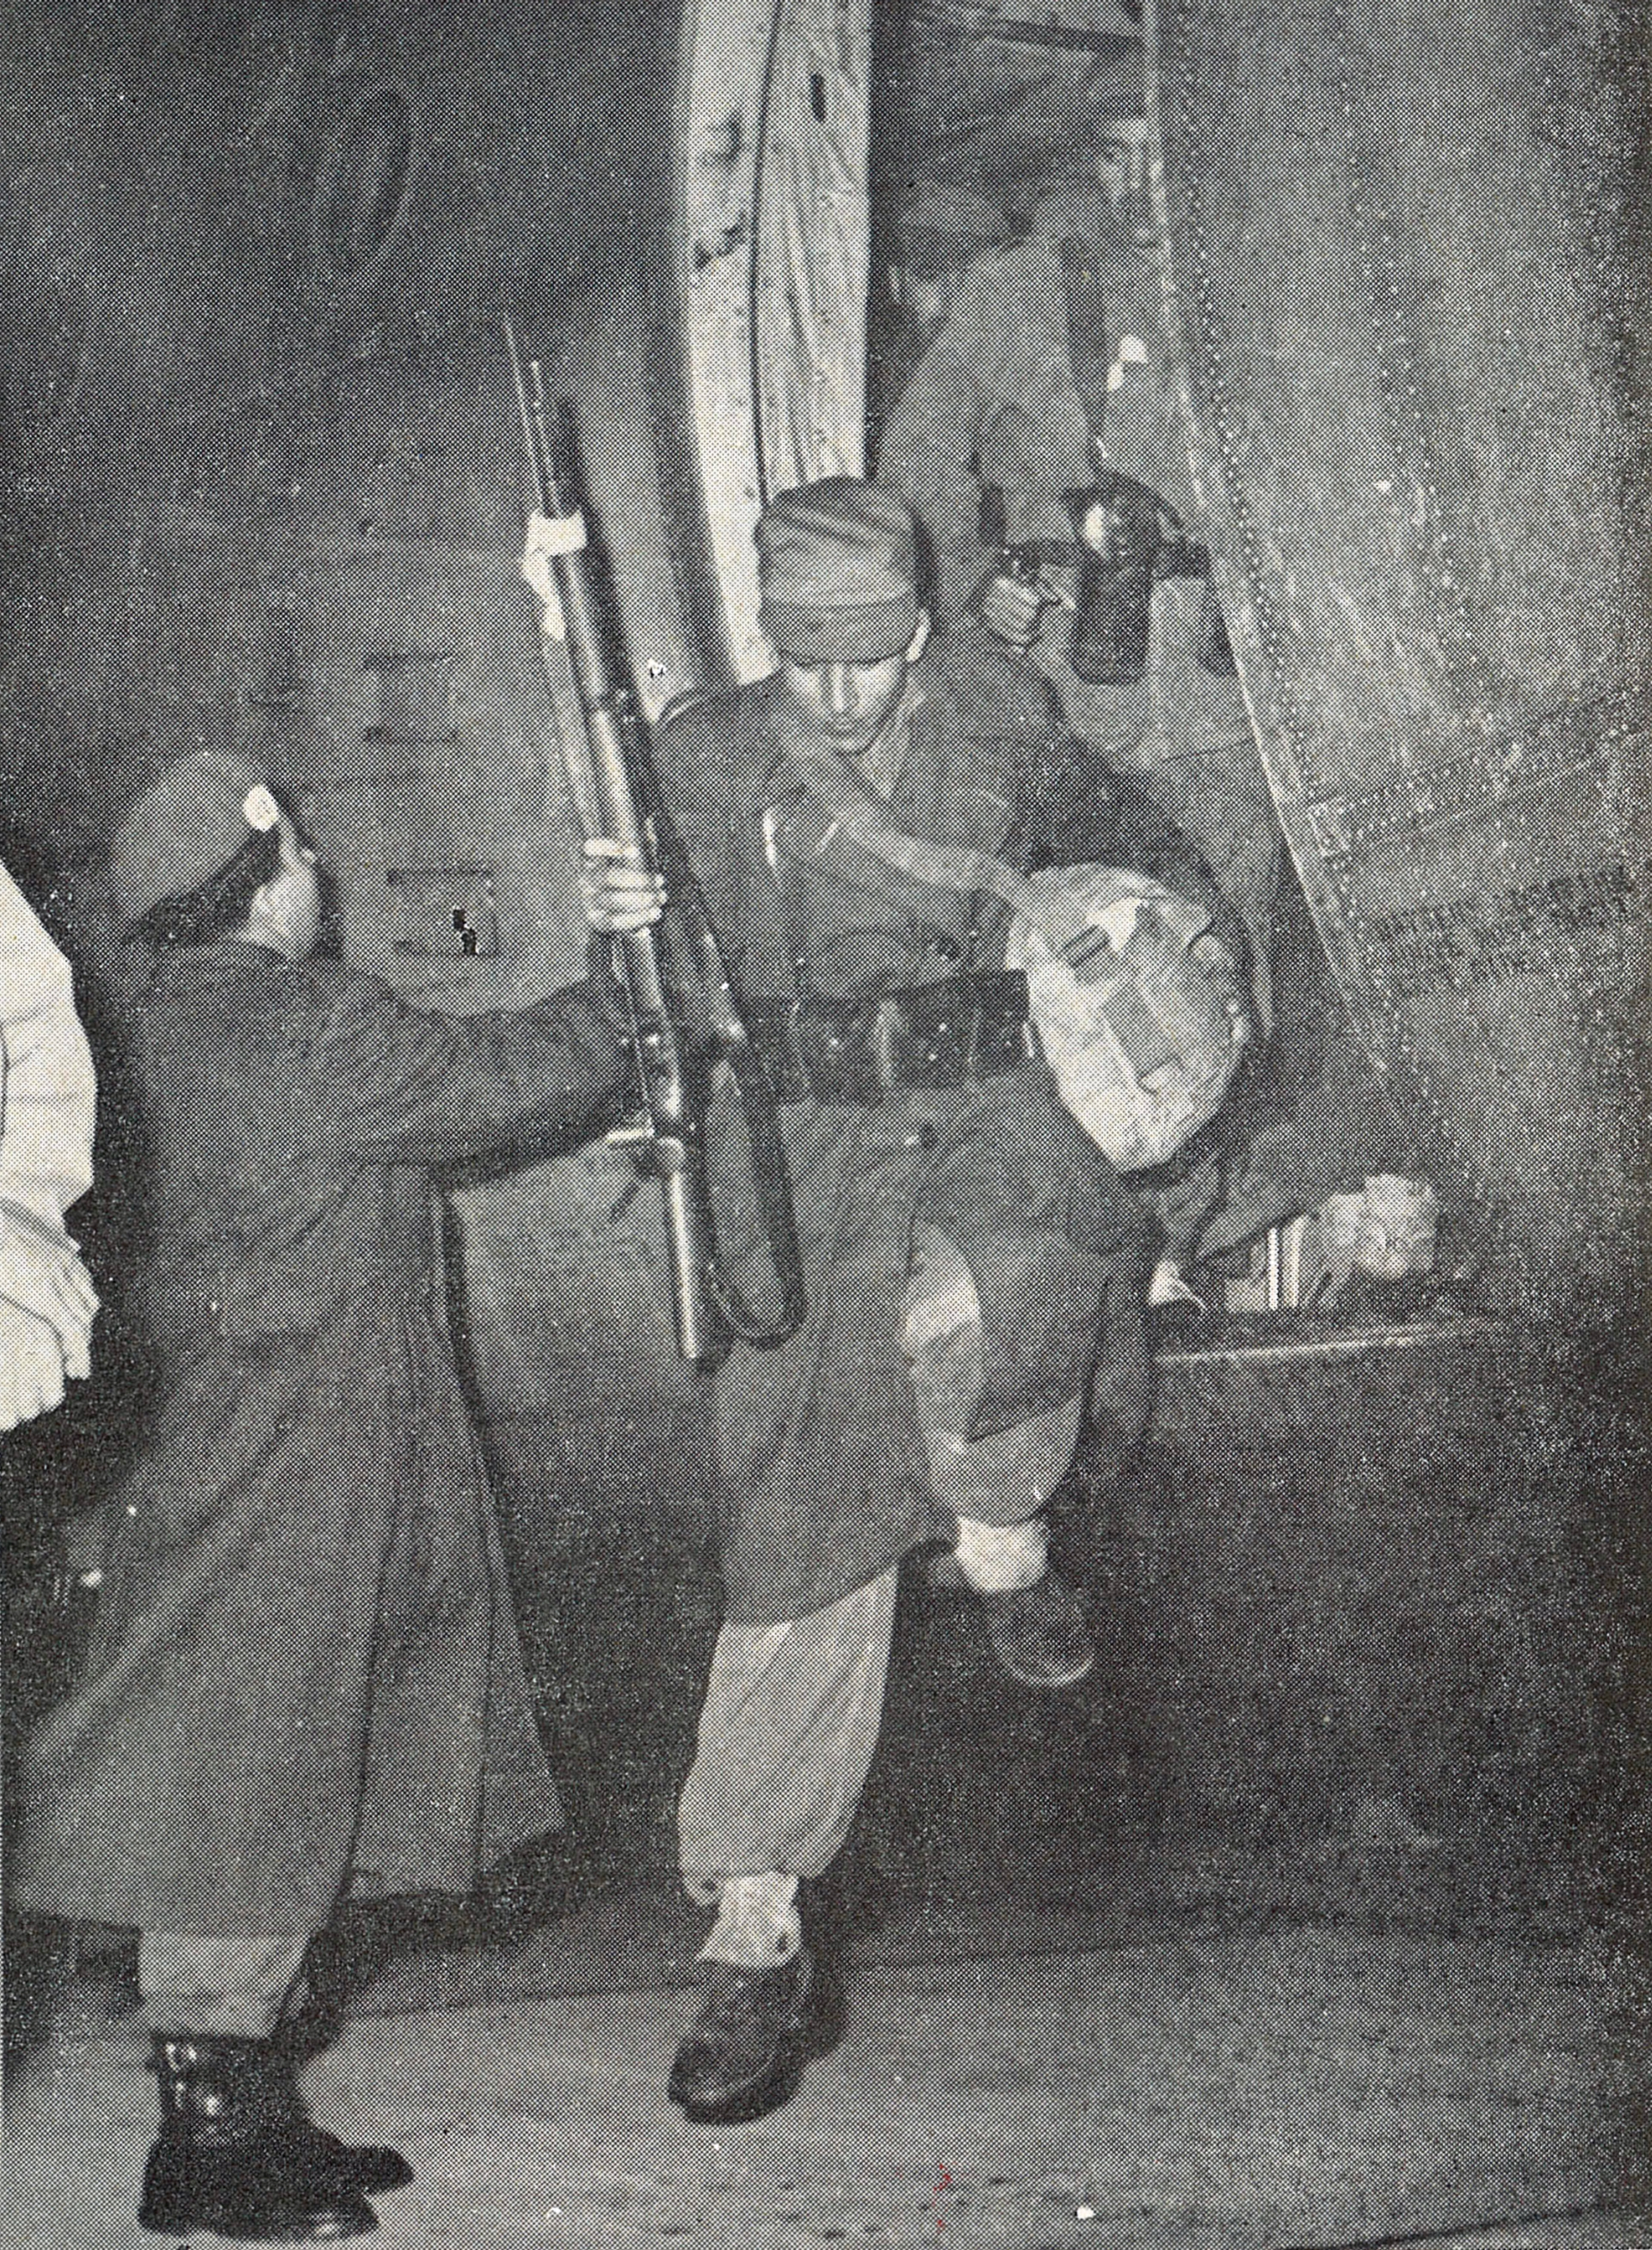 Les Forces Armées Royales au Congo - ONUC - 1960/61 31535609473_42e72e1f05_o